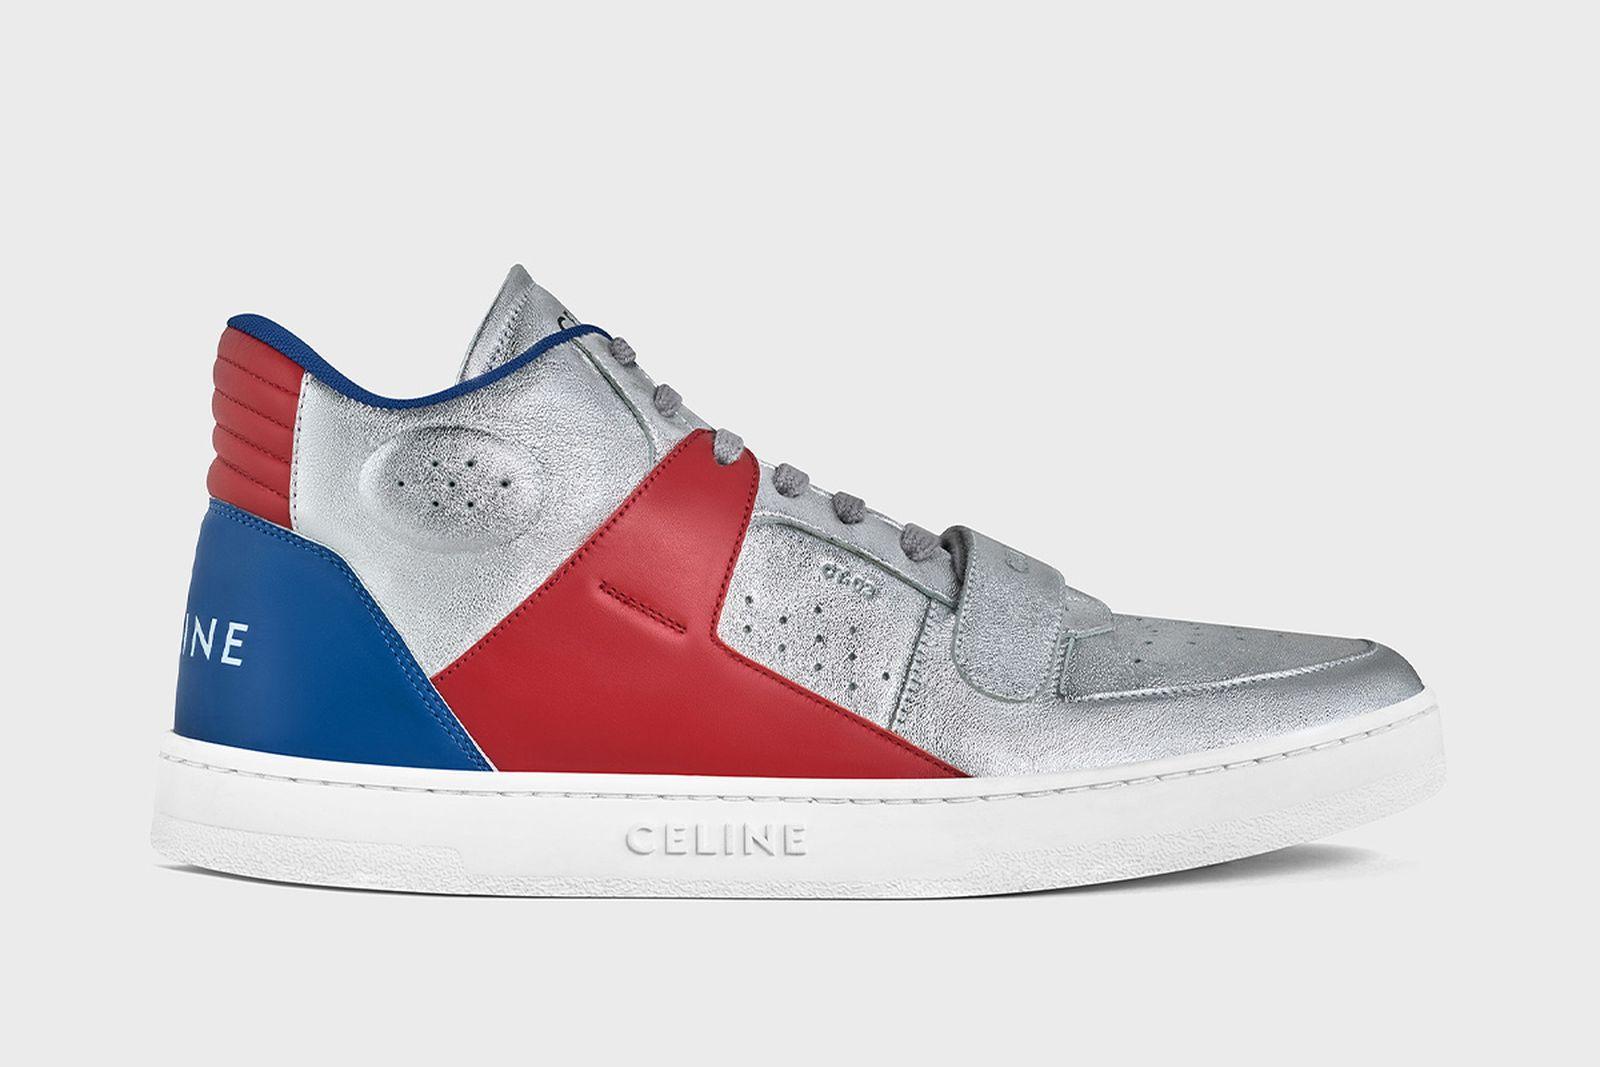 celine-trainer-1-release-date-price-20